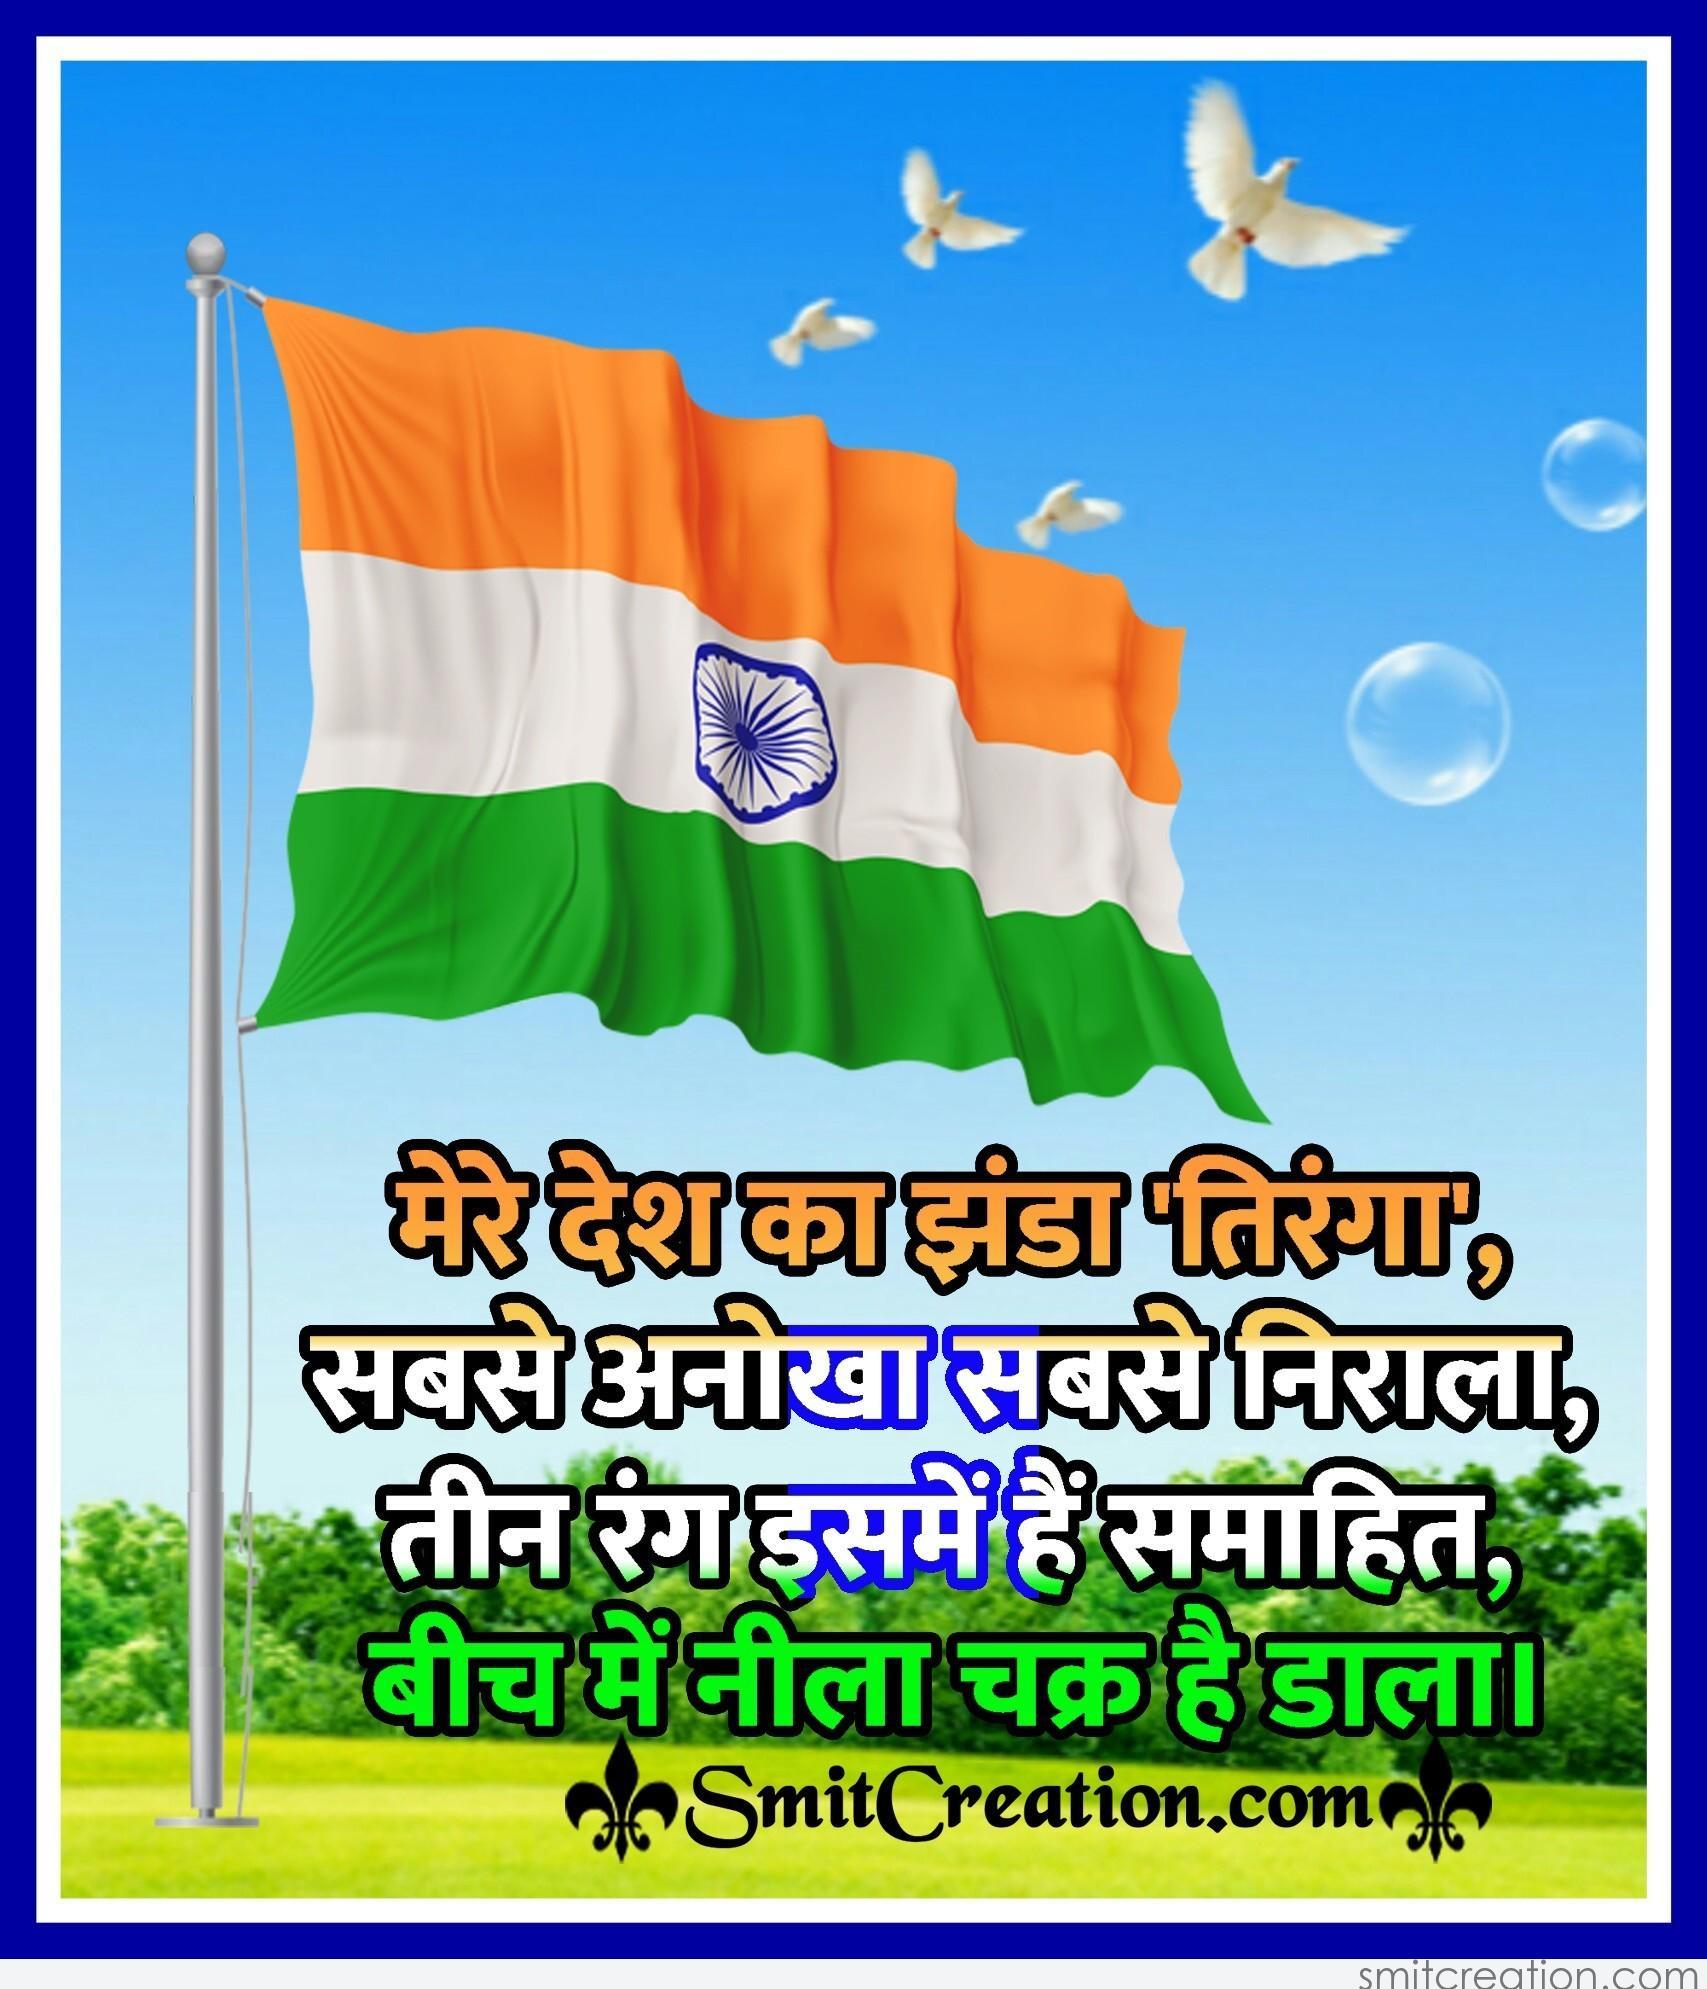 Mere Desh Ka Zanda Tiranga Hindi Lyrics Smitcreation Com